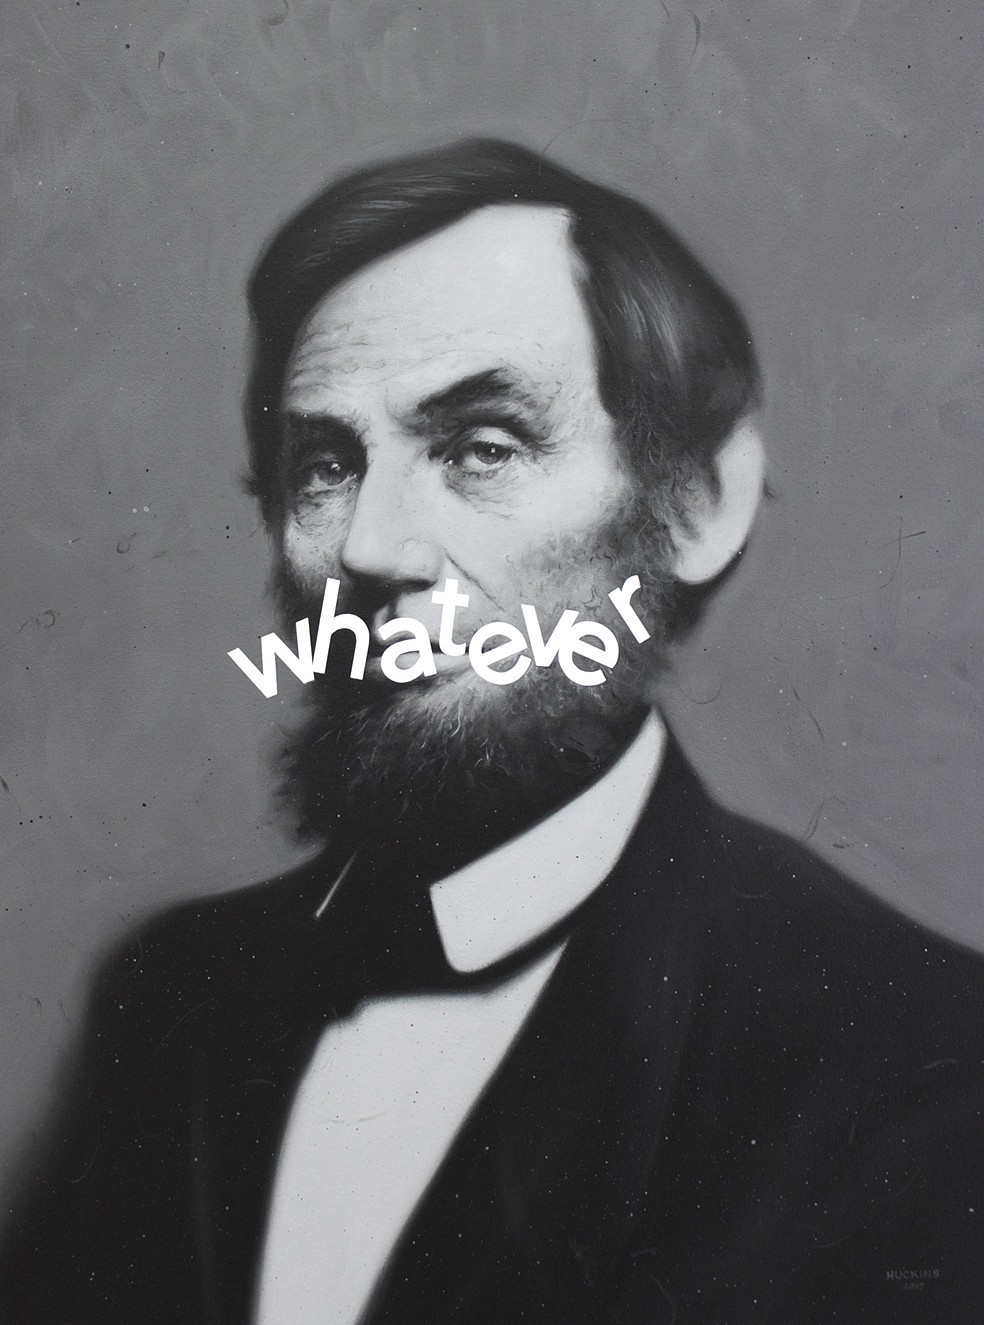 'Abraham Lincoln. Whatever' - Shawn Huckins